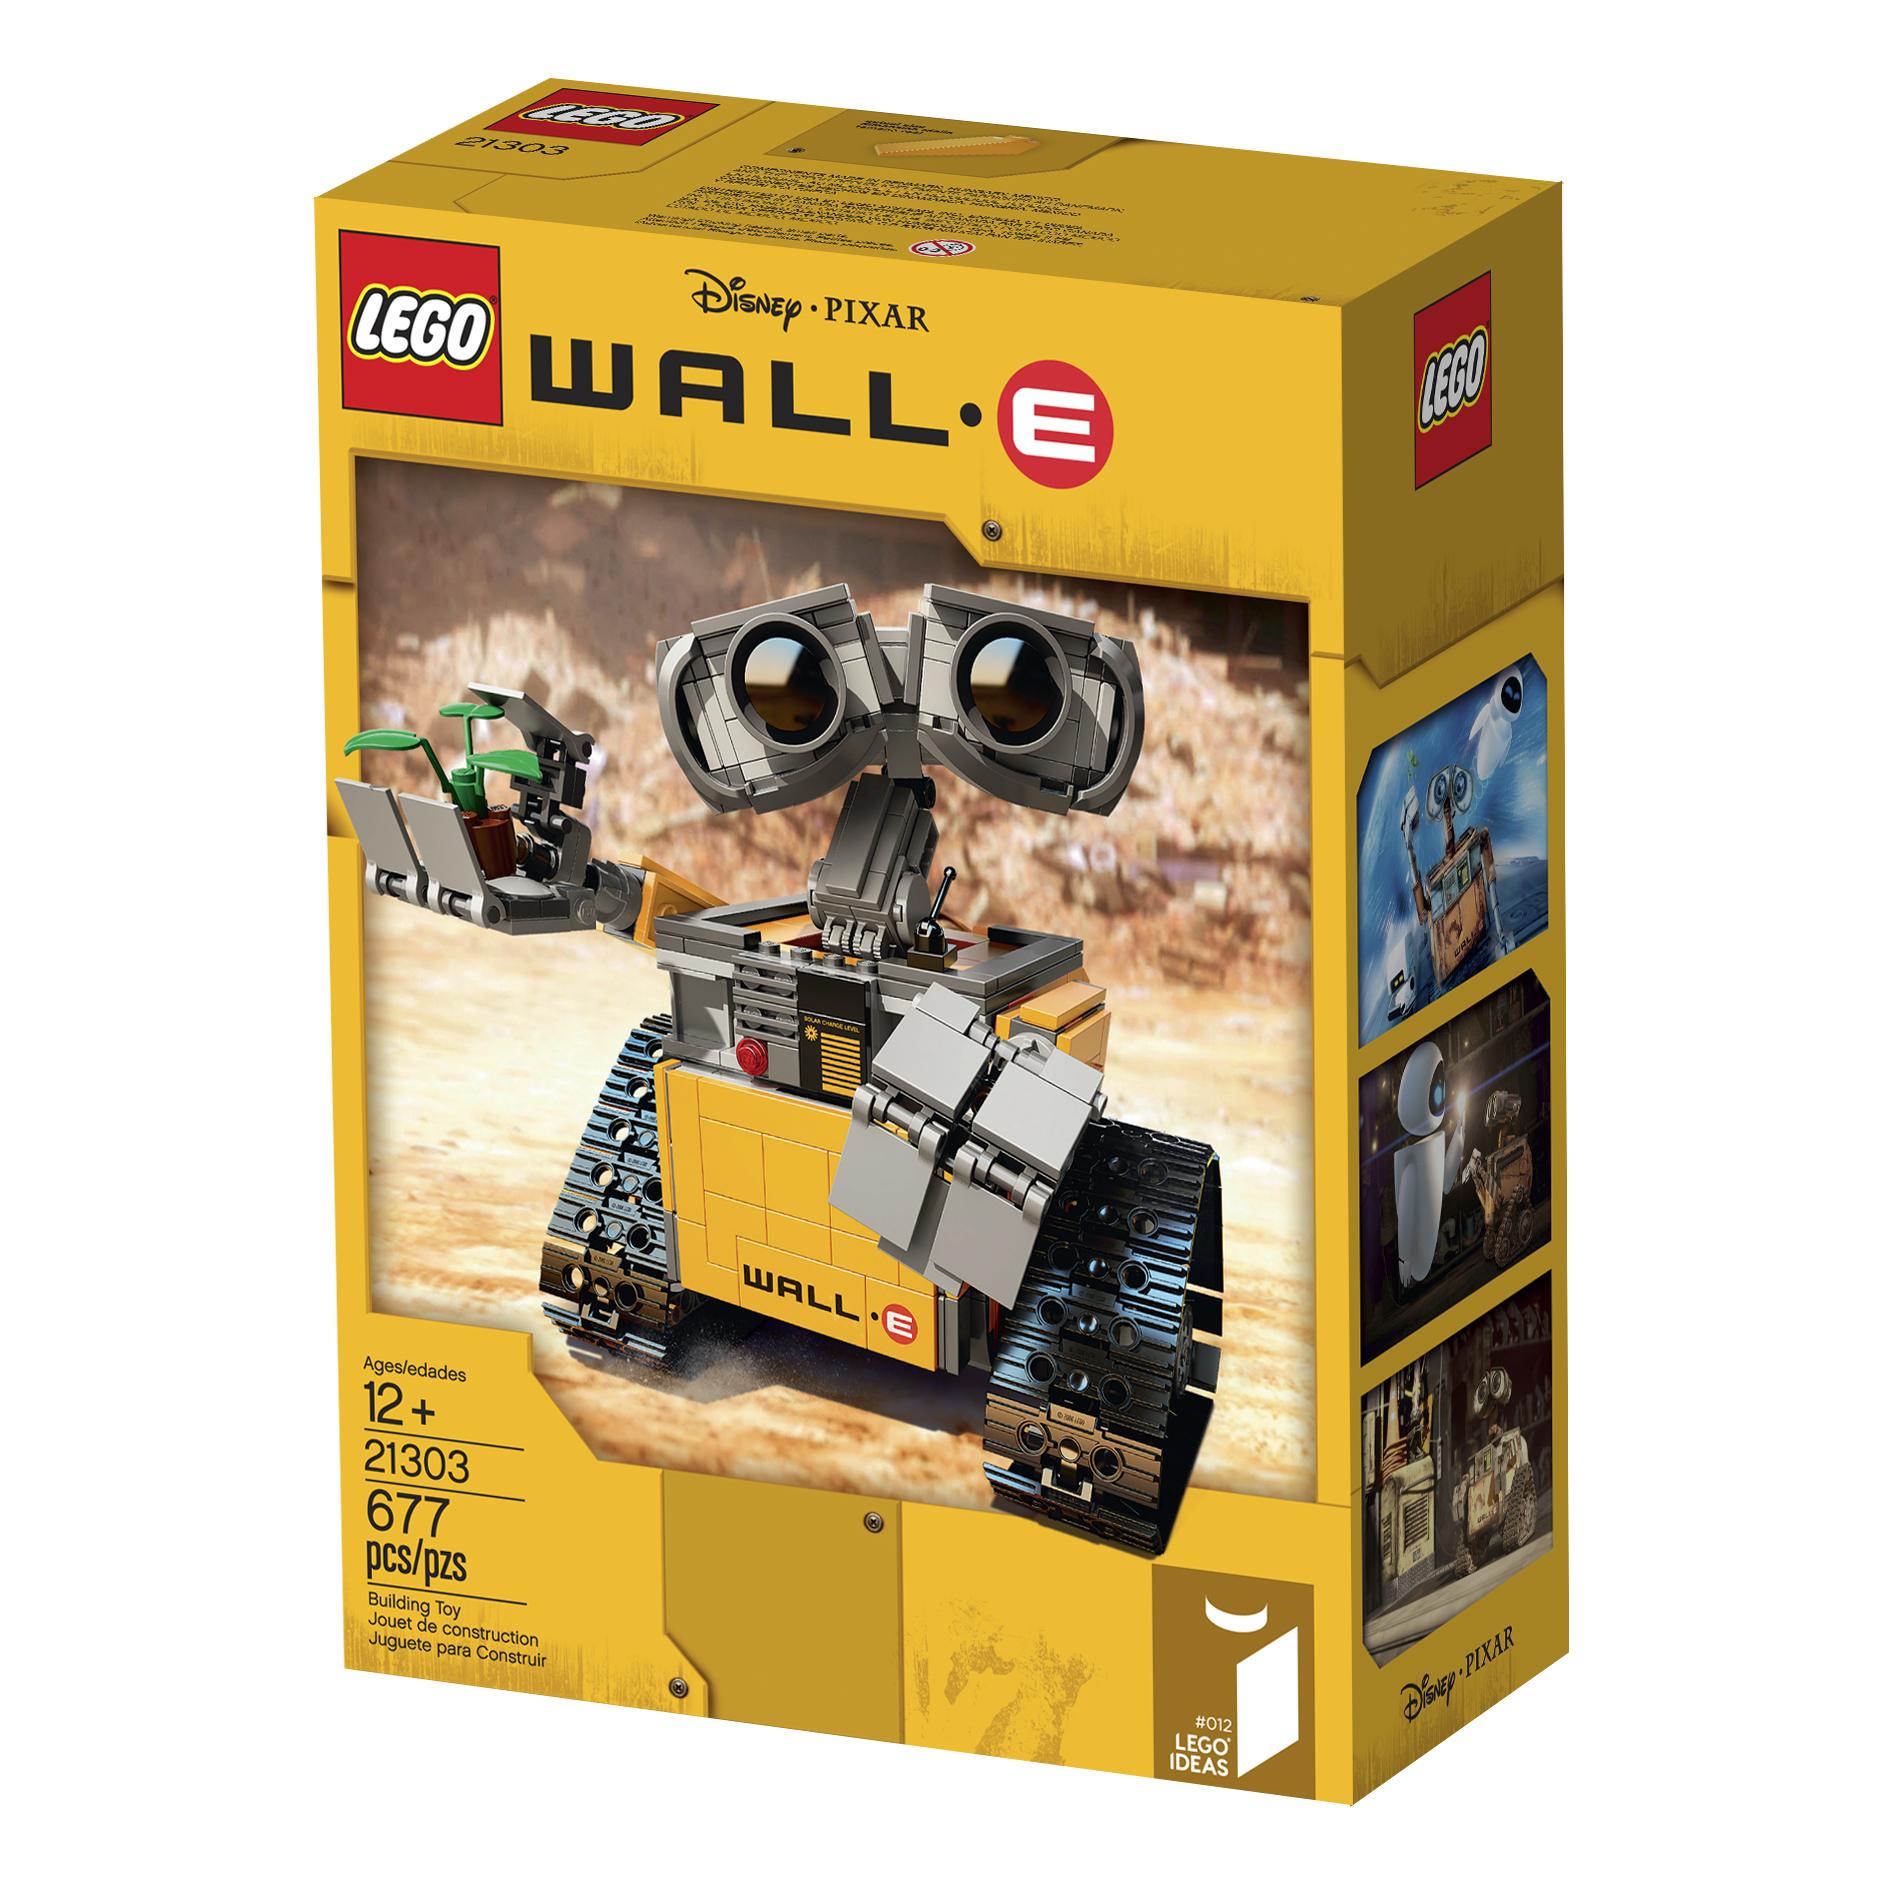 LEGO IDEAS - Blog - Introducing LEGO® Ideas #011 WALL•E